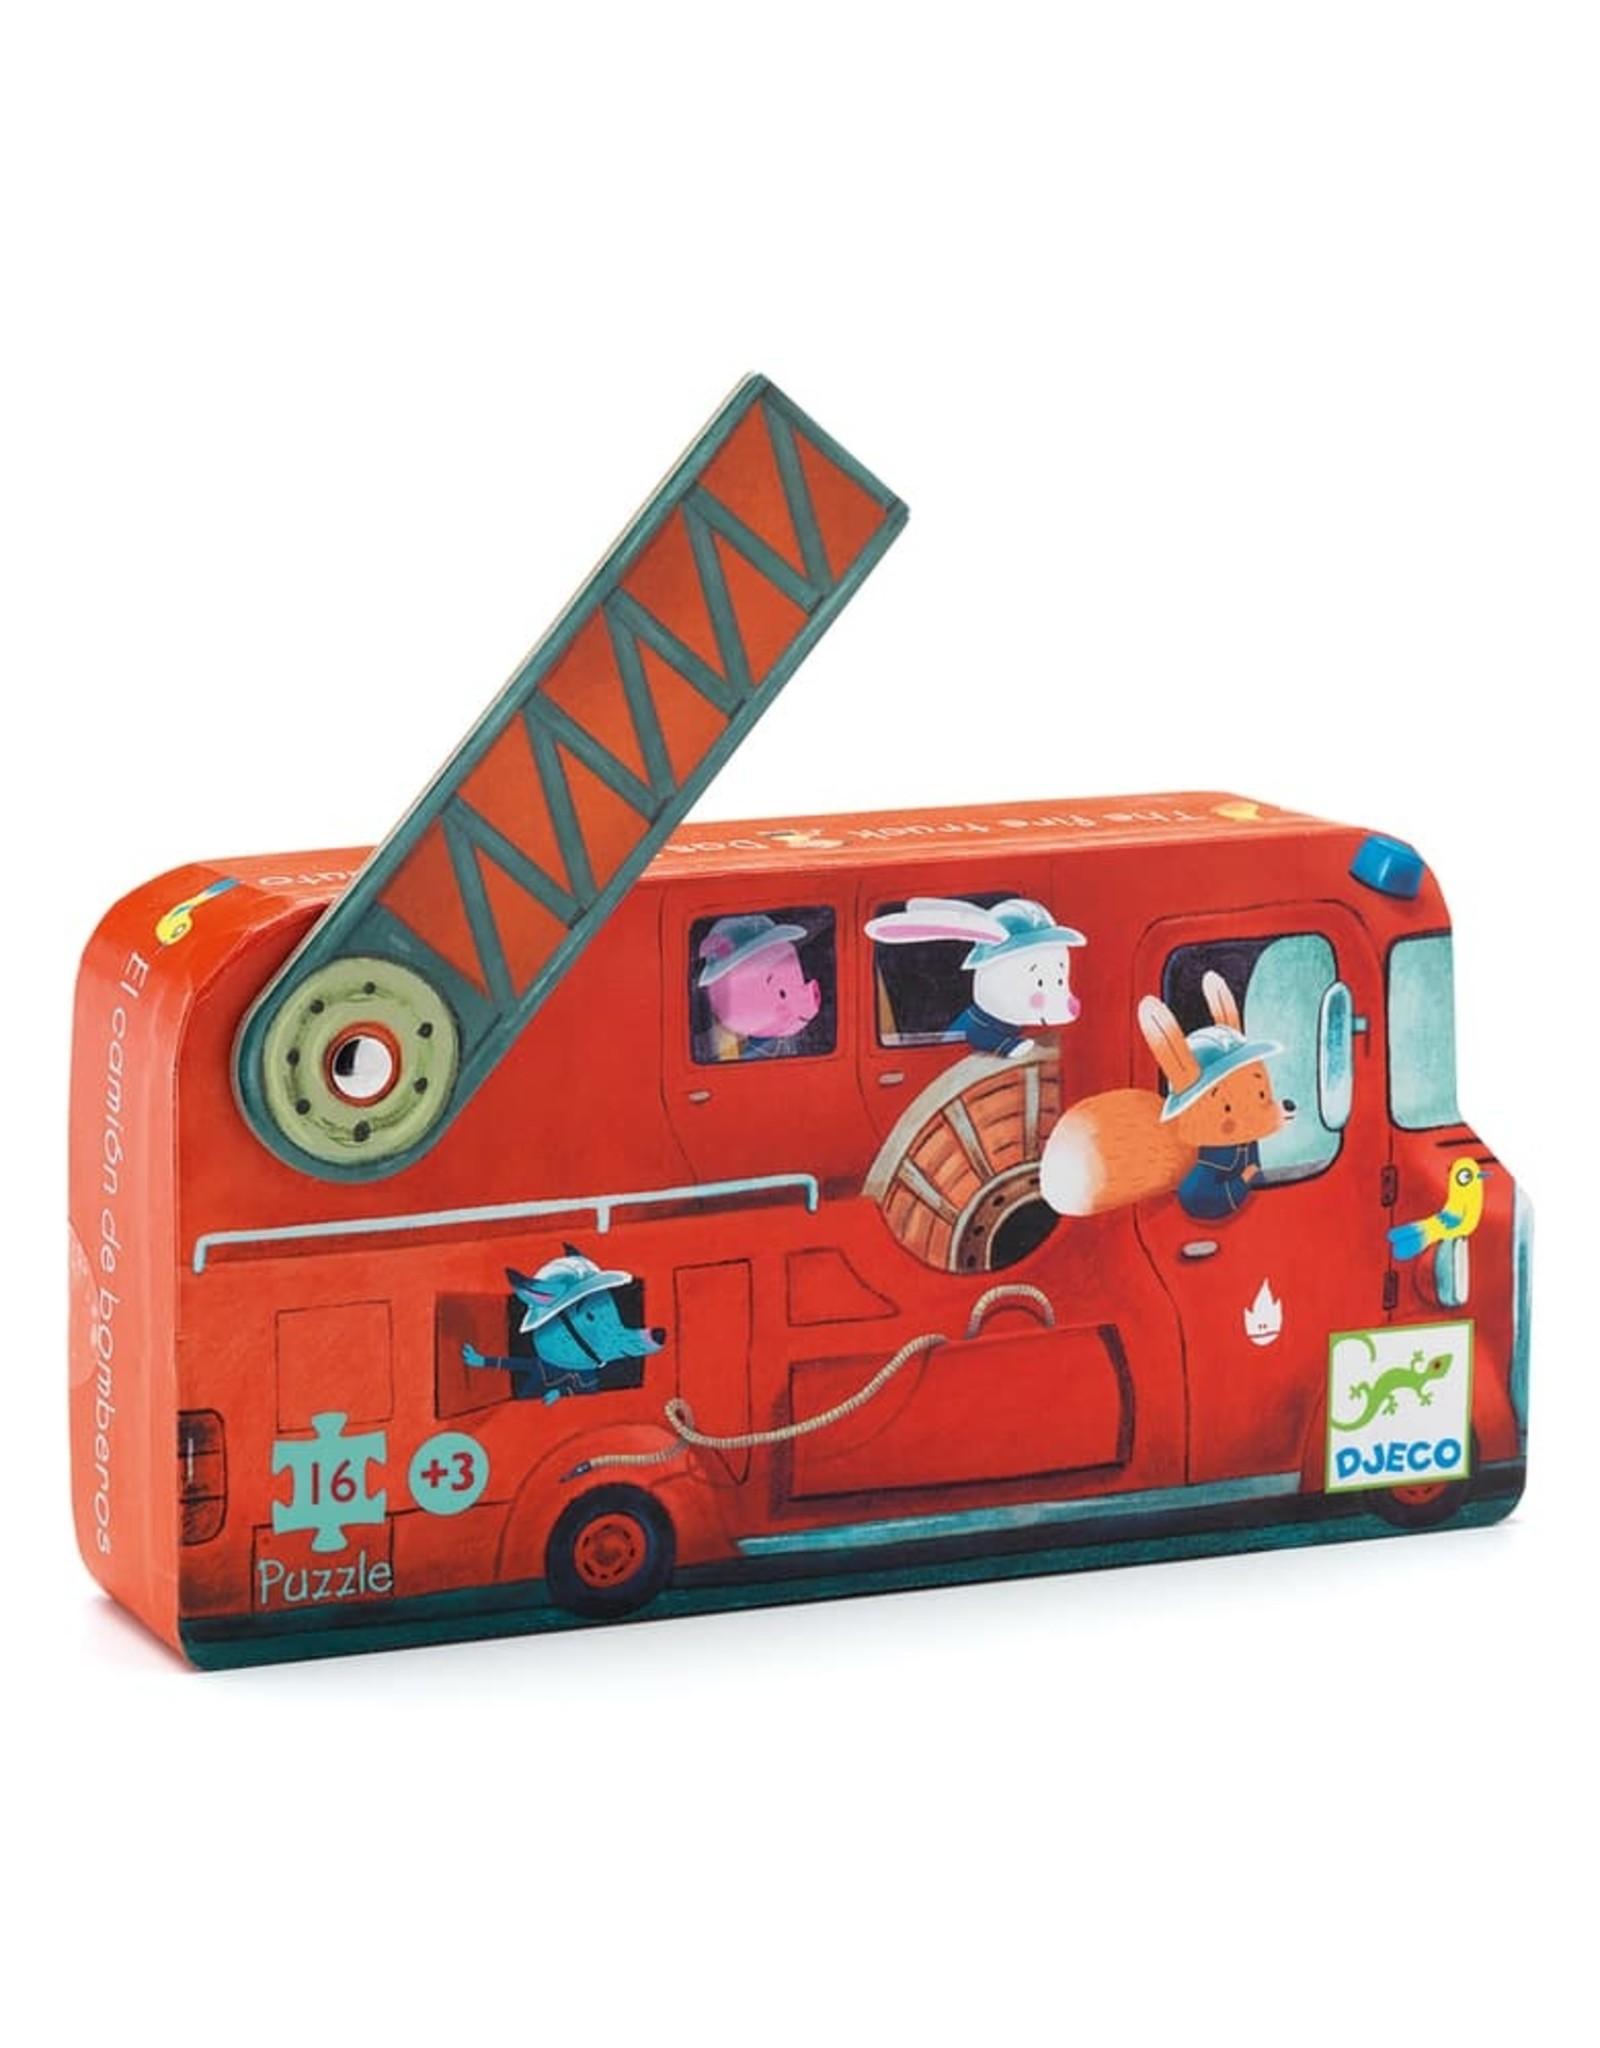 Djeco Silhouette The Fire Truck